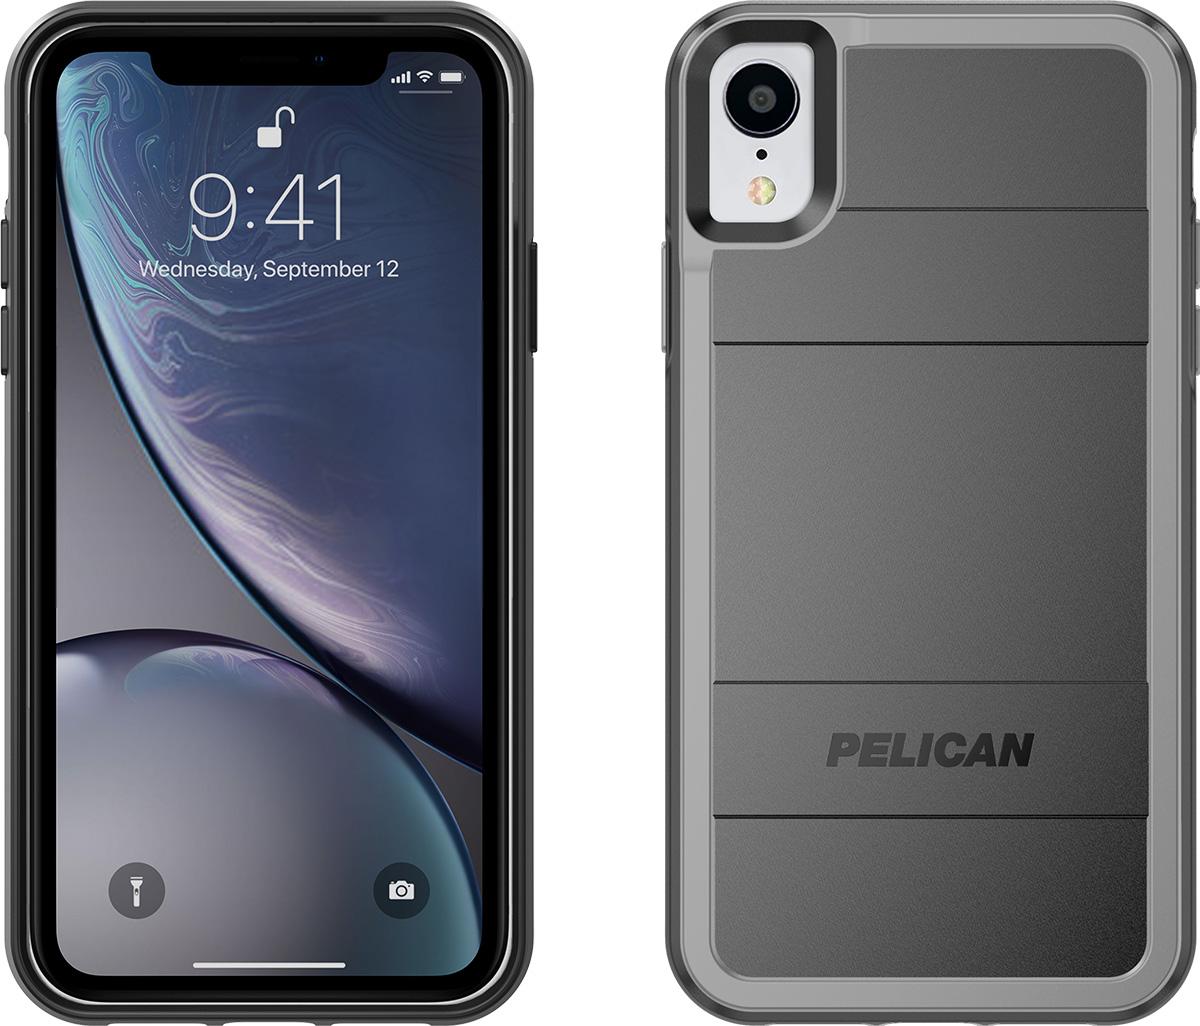 pelican apple iphone c42150 protector ams black phone case